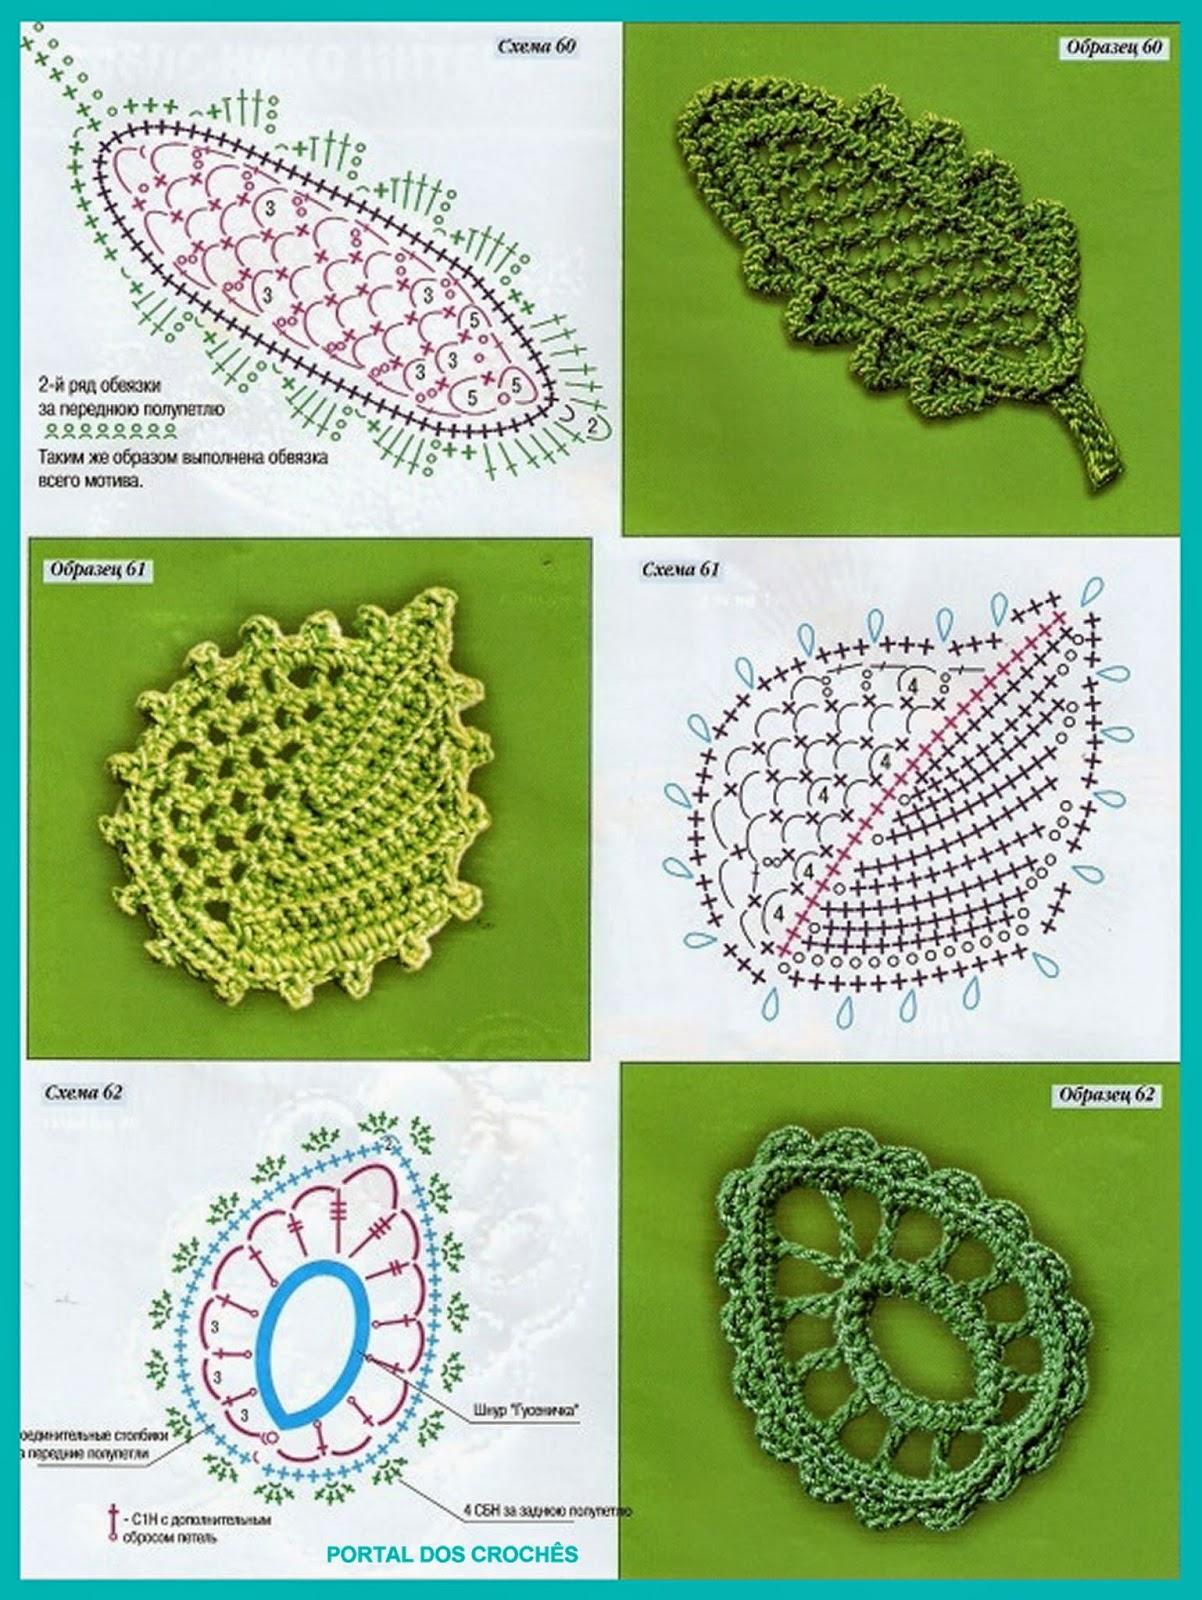 Free Leaf Crochet Pattern Diagram Electric Baseboard Heat Wiring Portal Dos CrochÊs Flores E Folhas De CrochÊ Para AplicaÇÕes